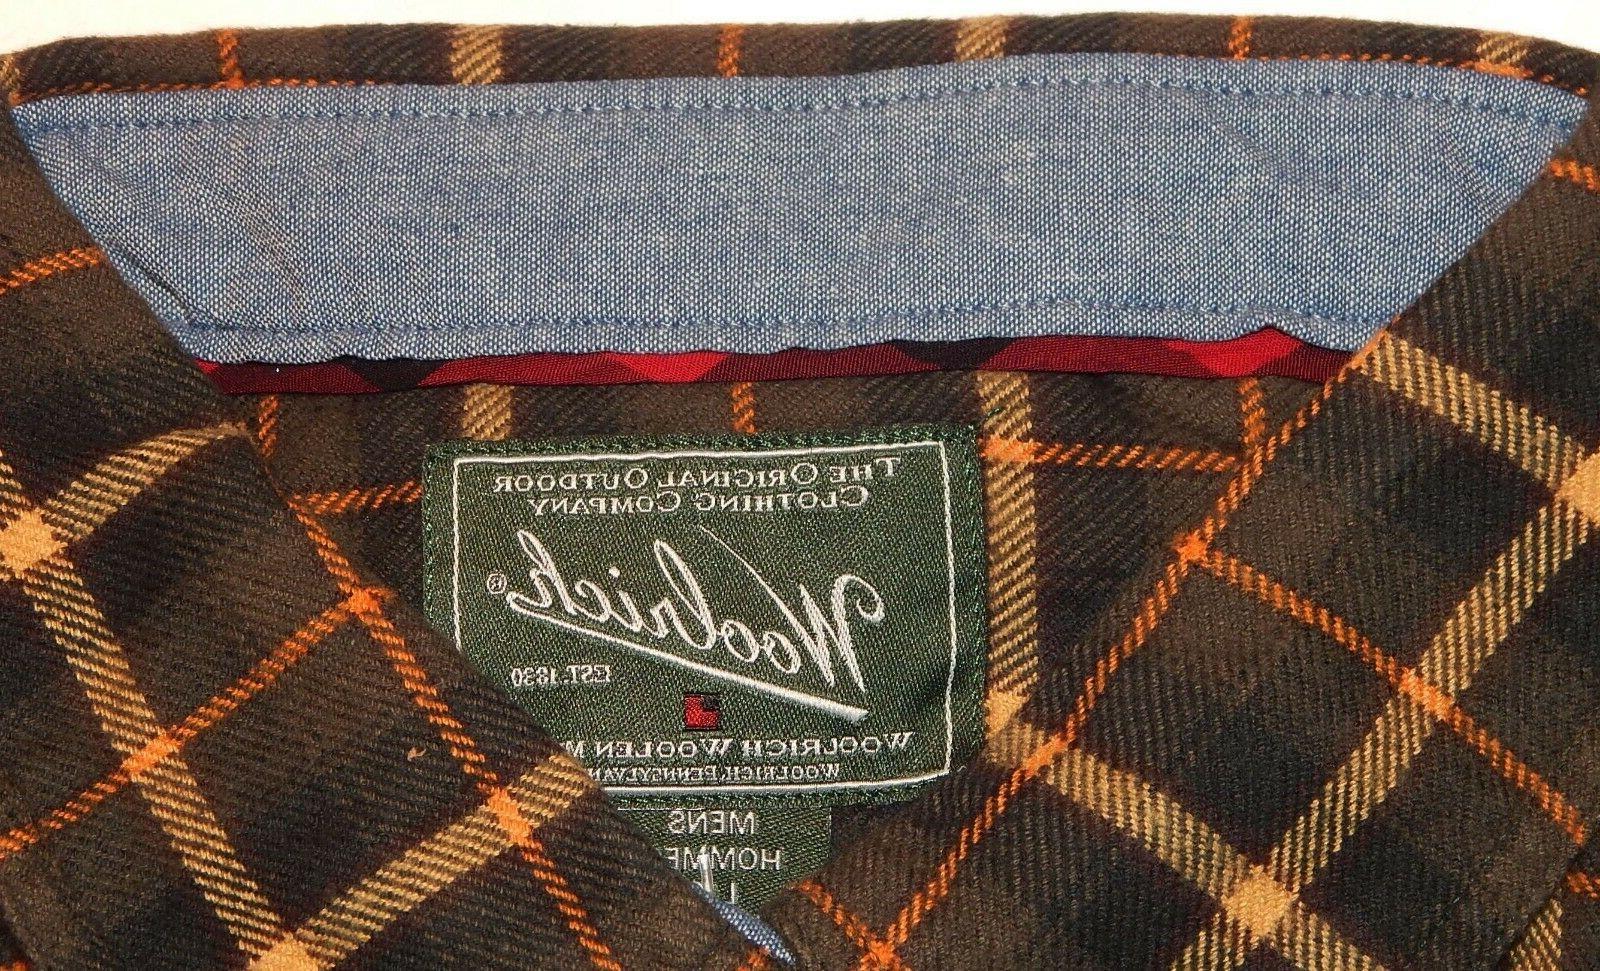 Woolrich Button-Down Shirt Size L $55